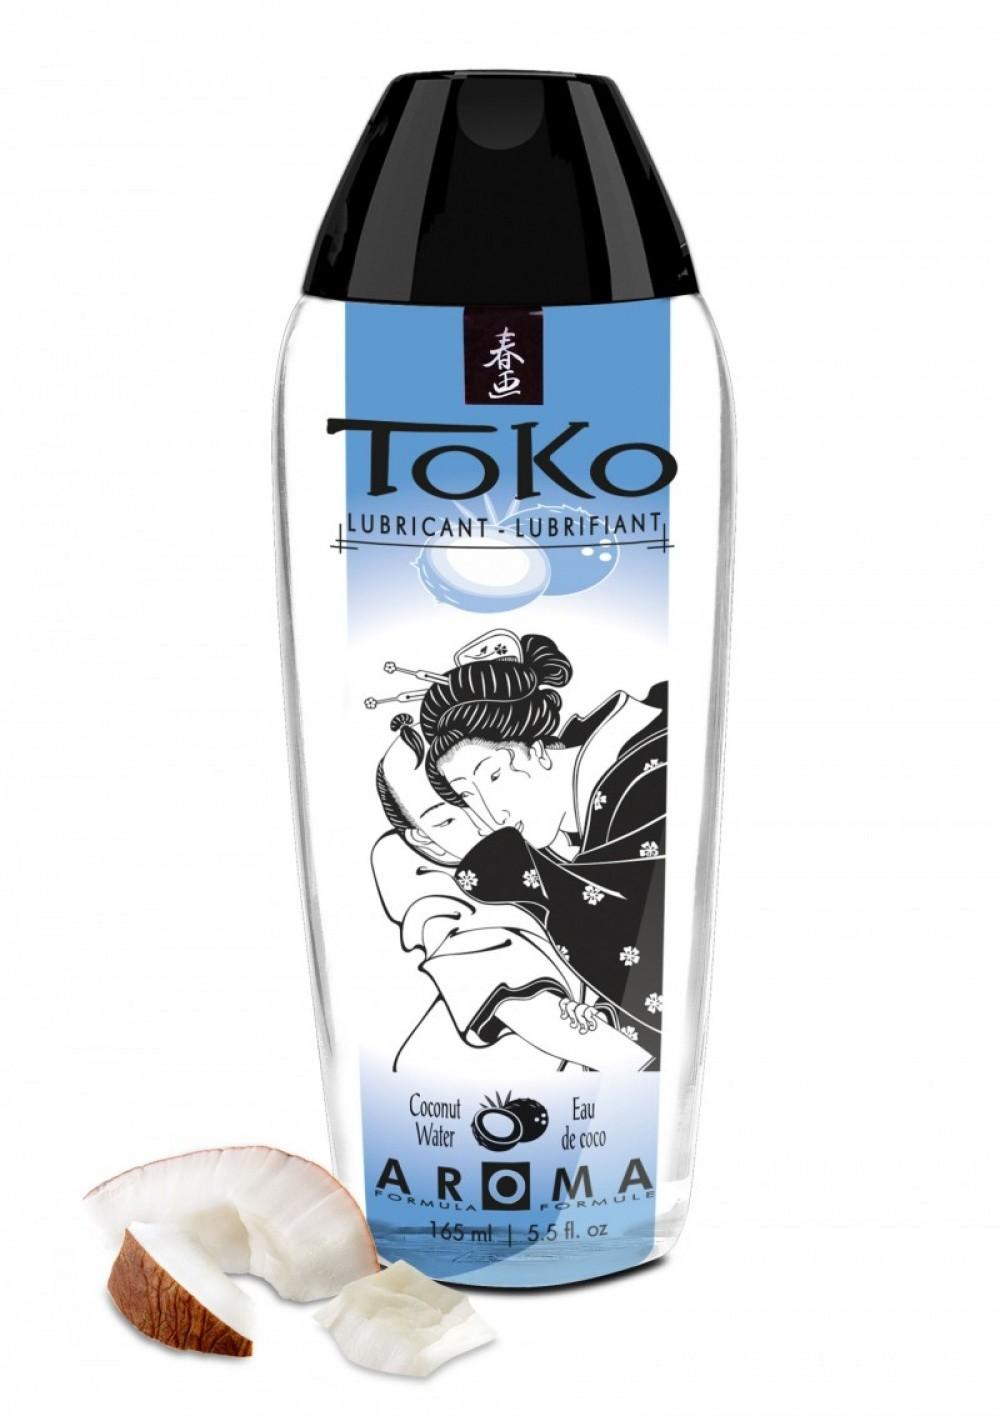 Shunga Lubrifiant Eau comestible Toko Aroma 165 ml Coconut